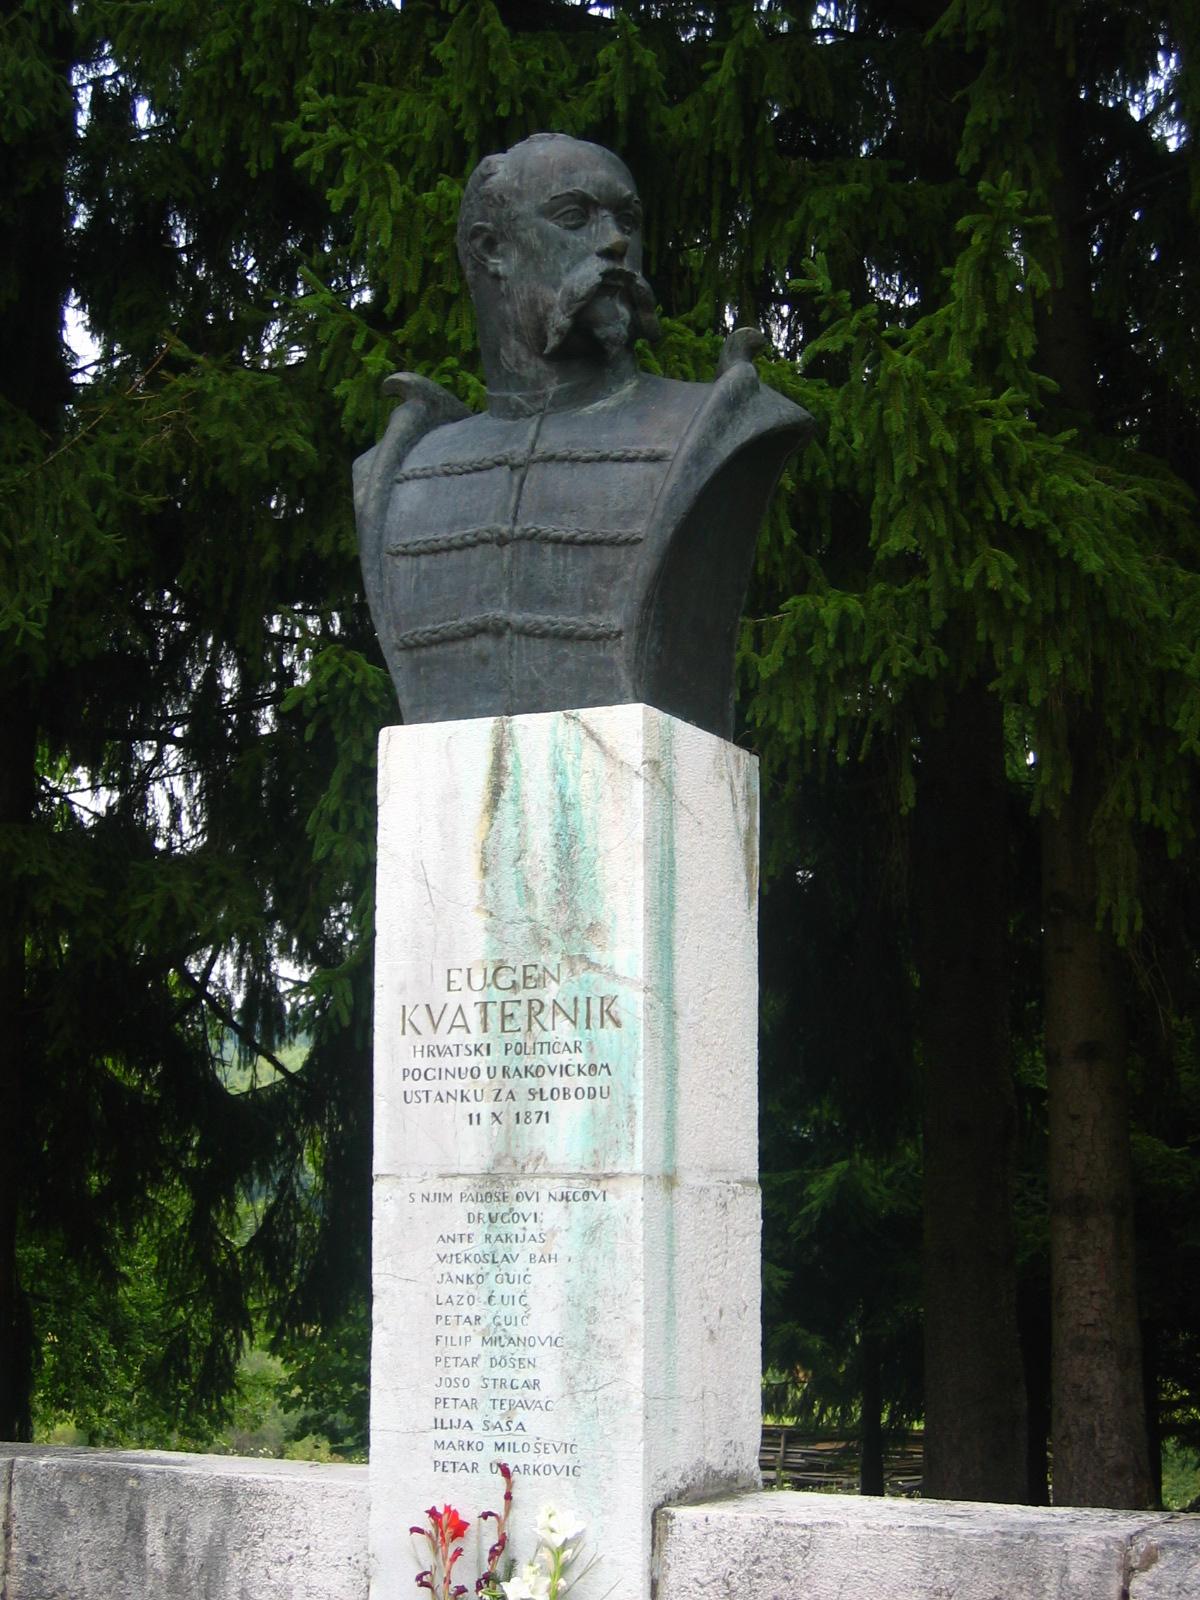 Eugen Kvaternik Wikiwand